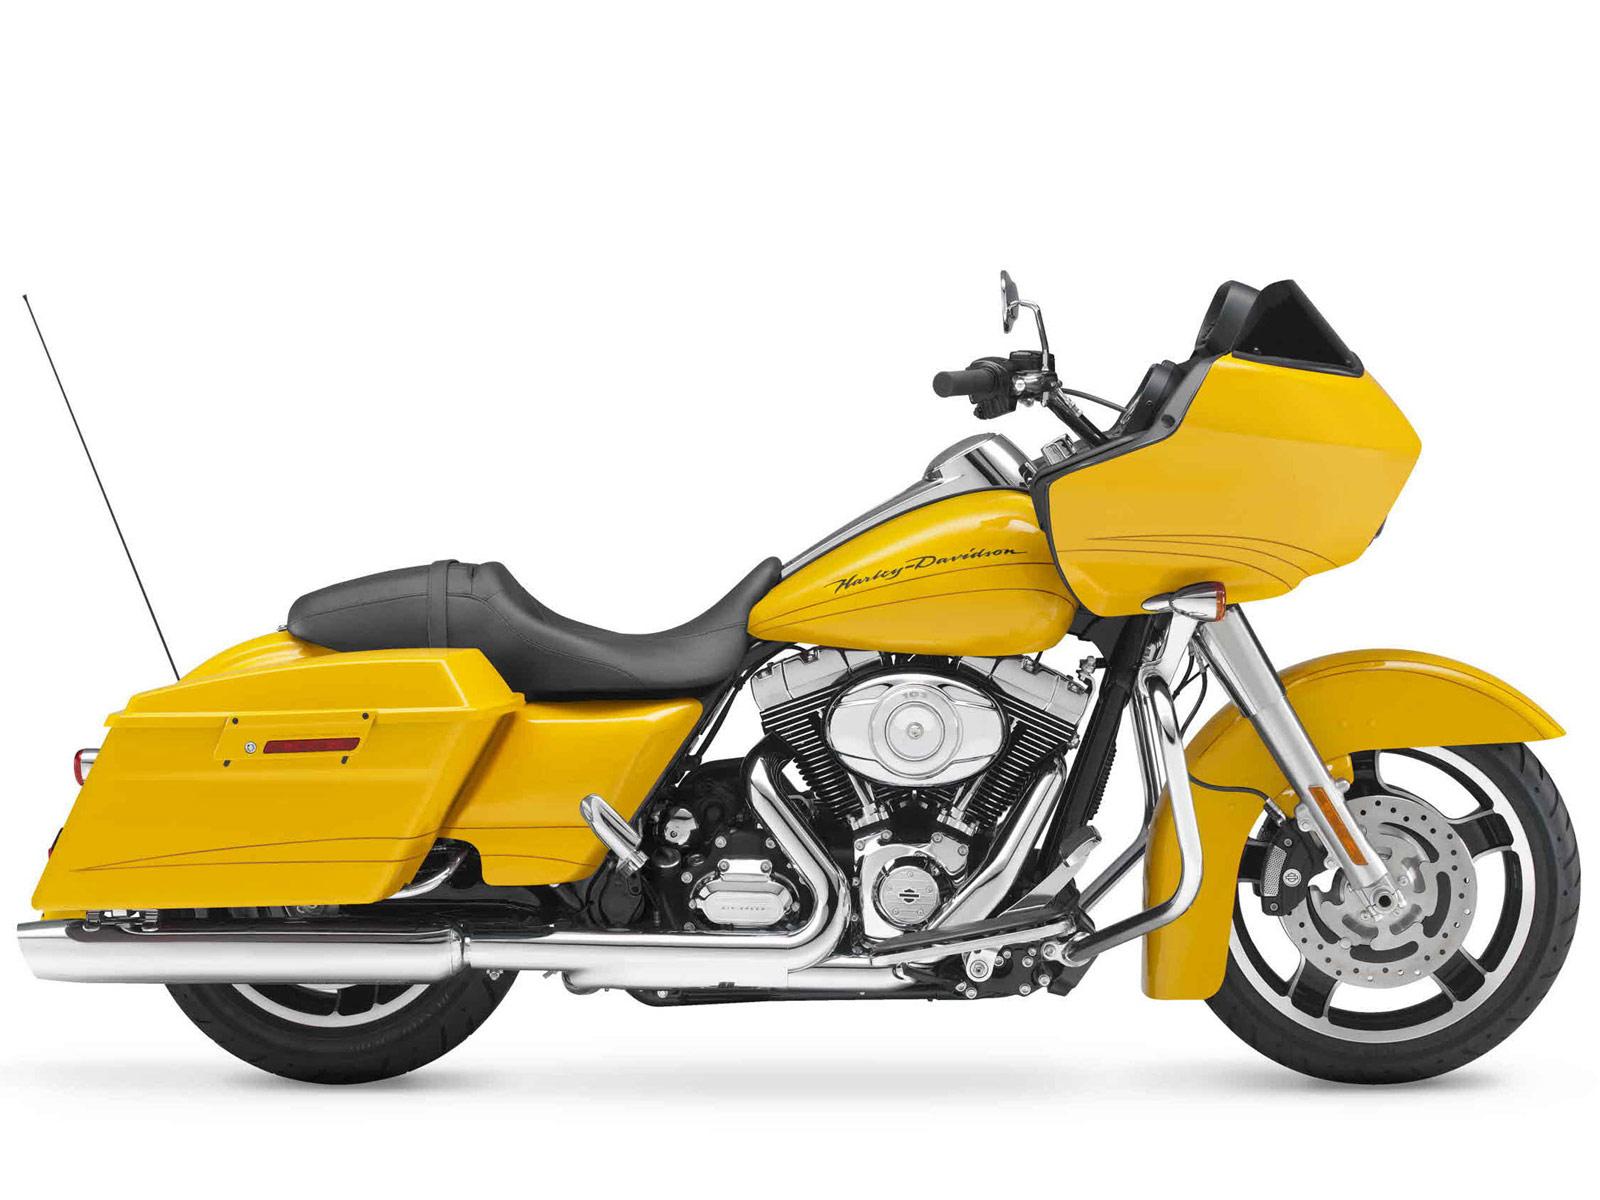 2012 HarleyDavidson FLTRX Road Glide Custom pictures, specifications